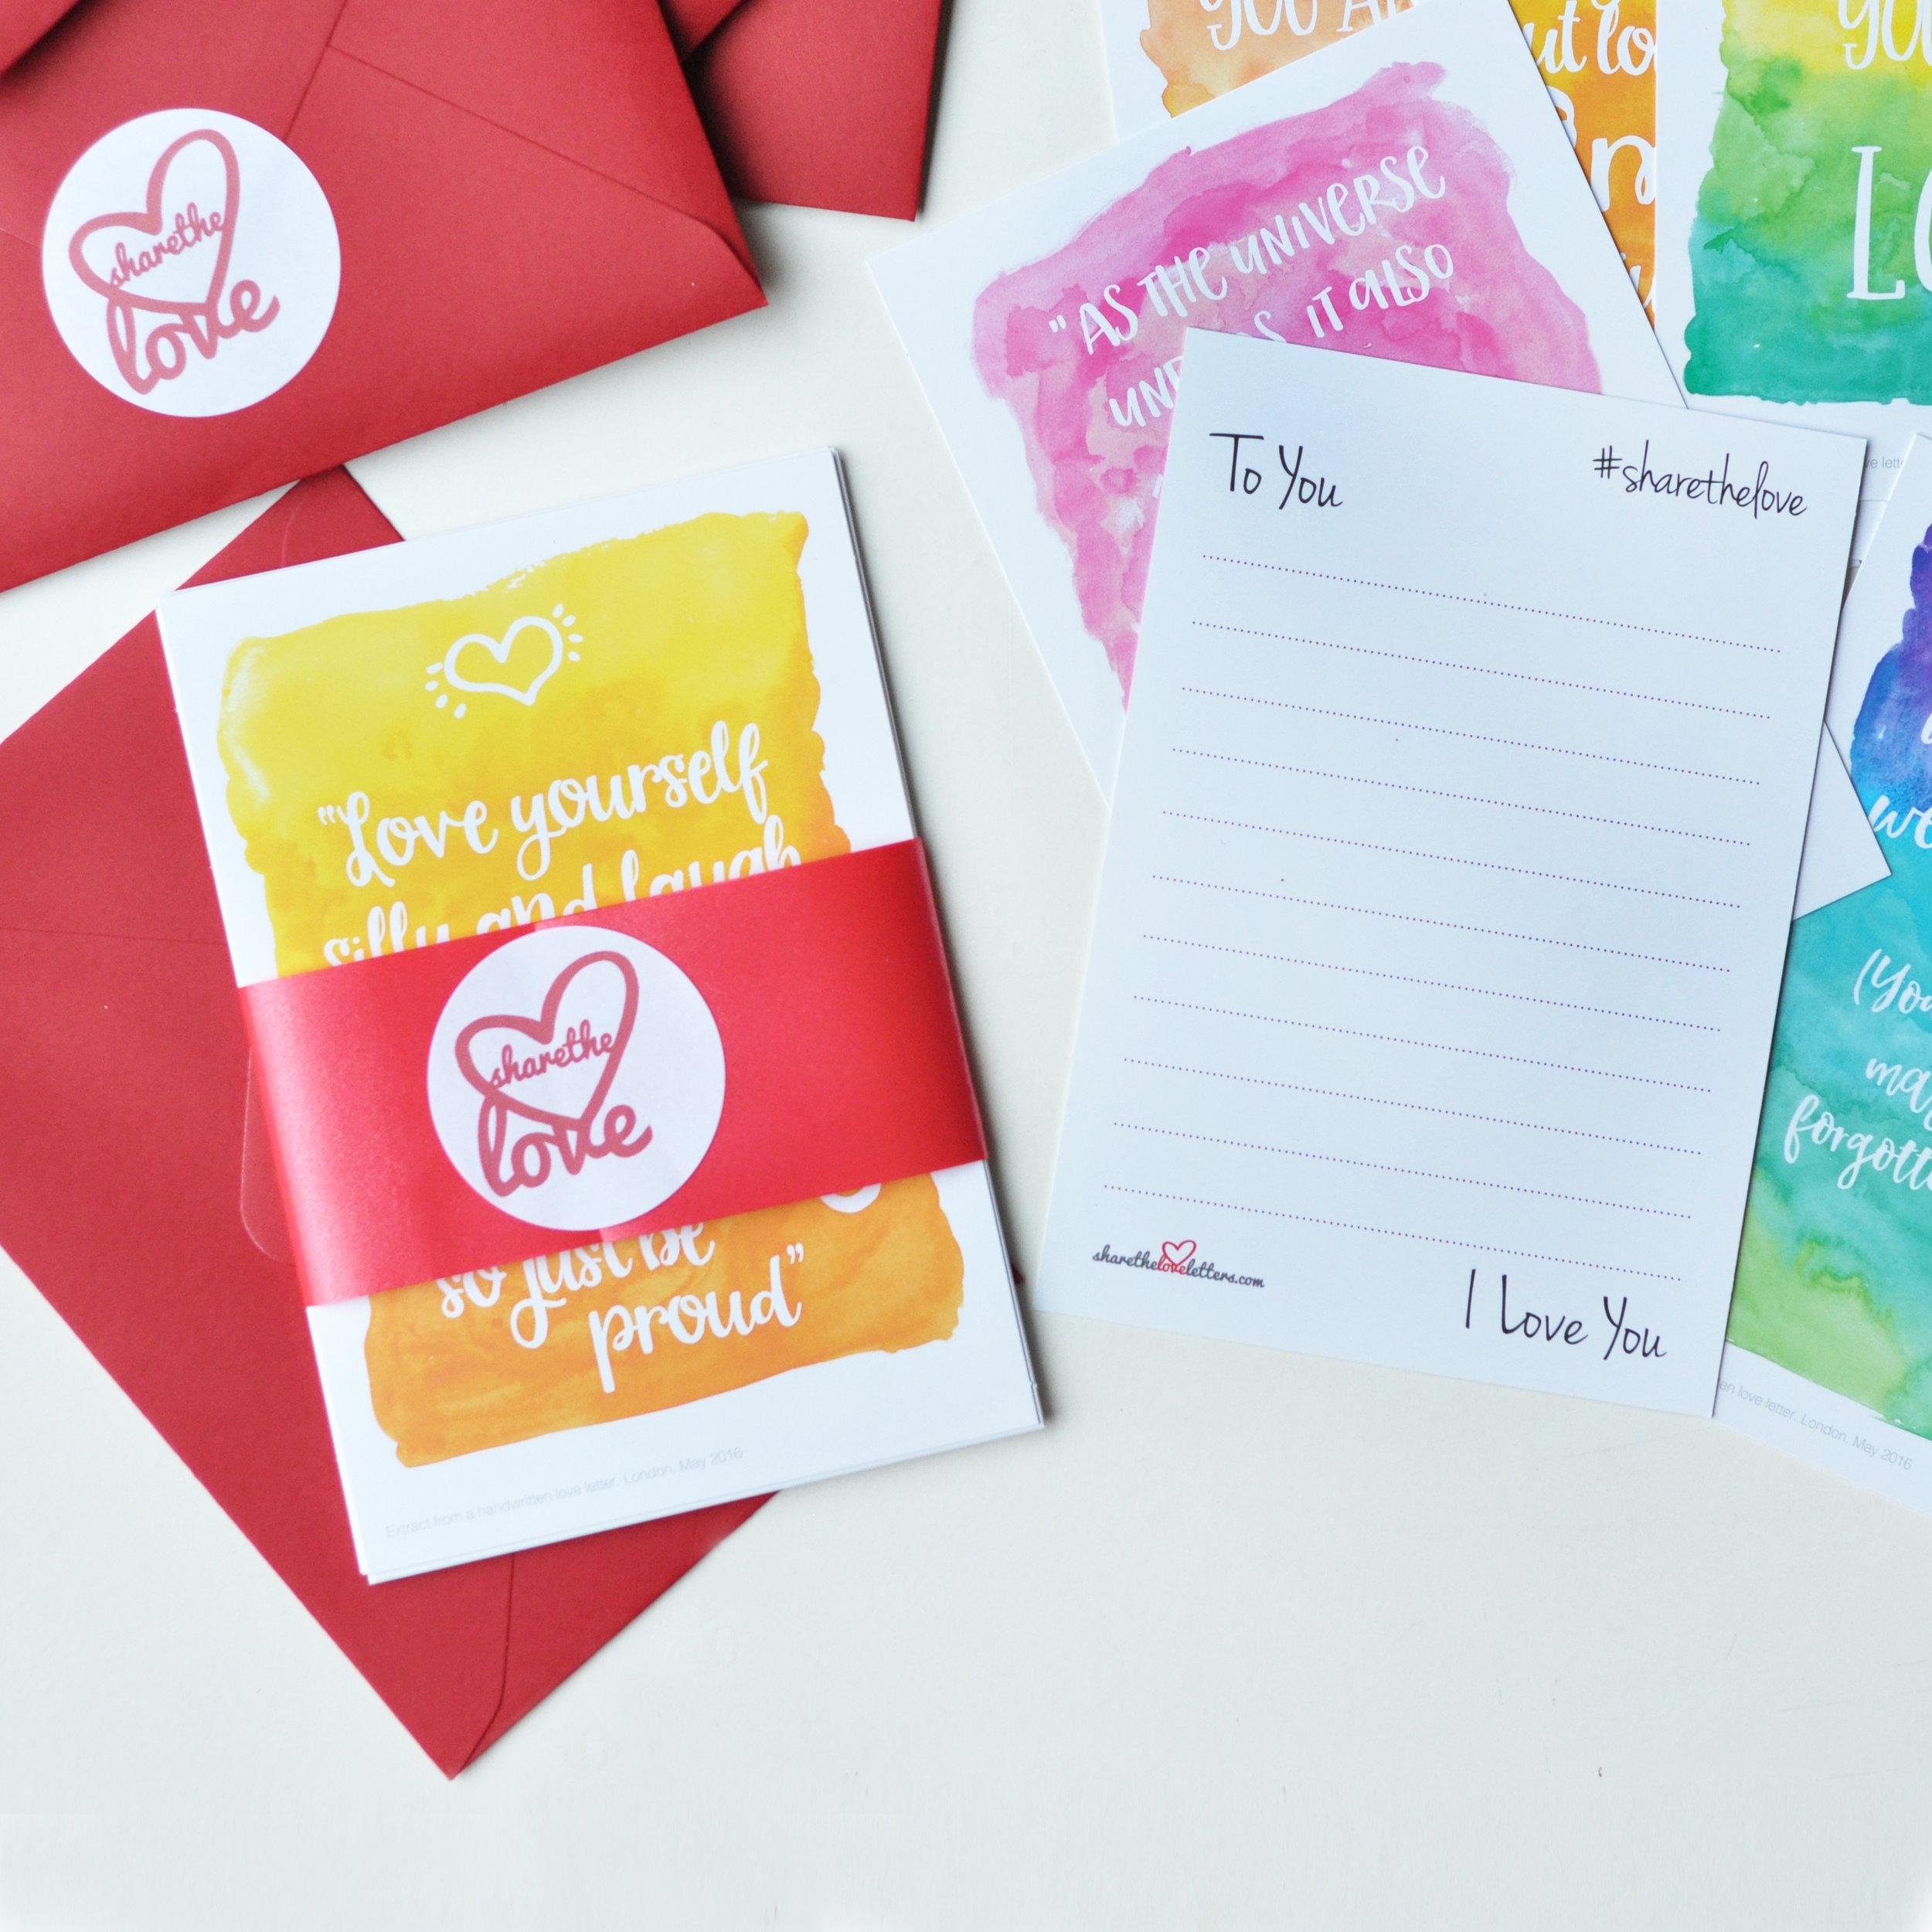 cards 5.jpg